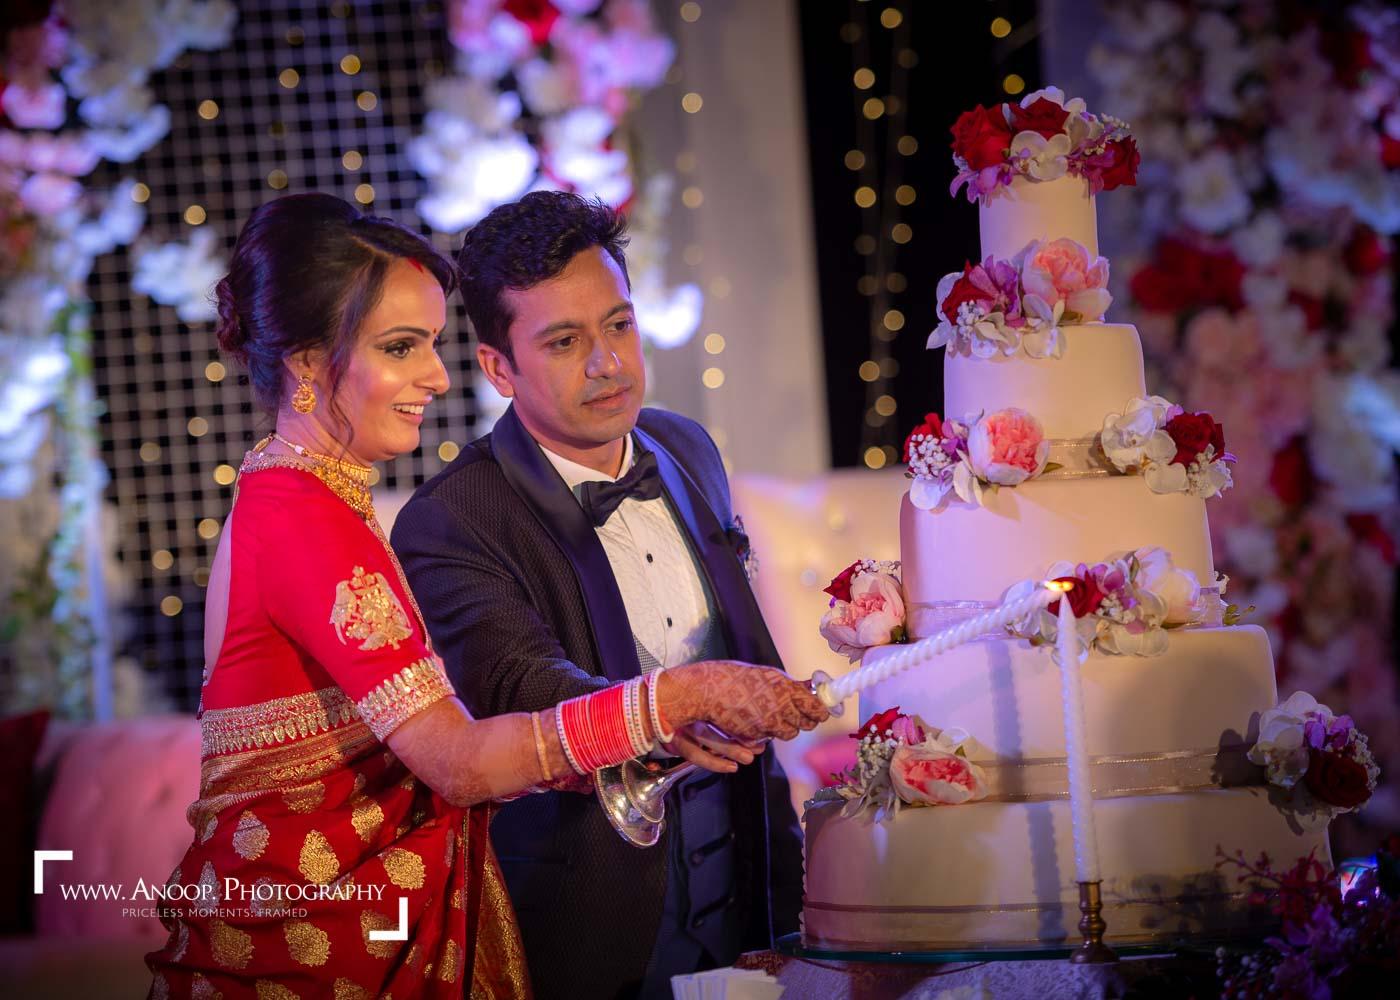 Destination-Nepali-Wedding-in-thailand-sheraton-hua-hin-035